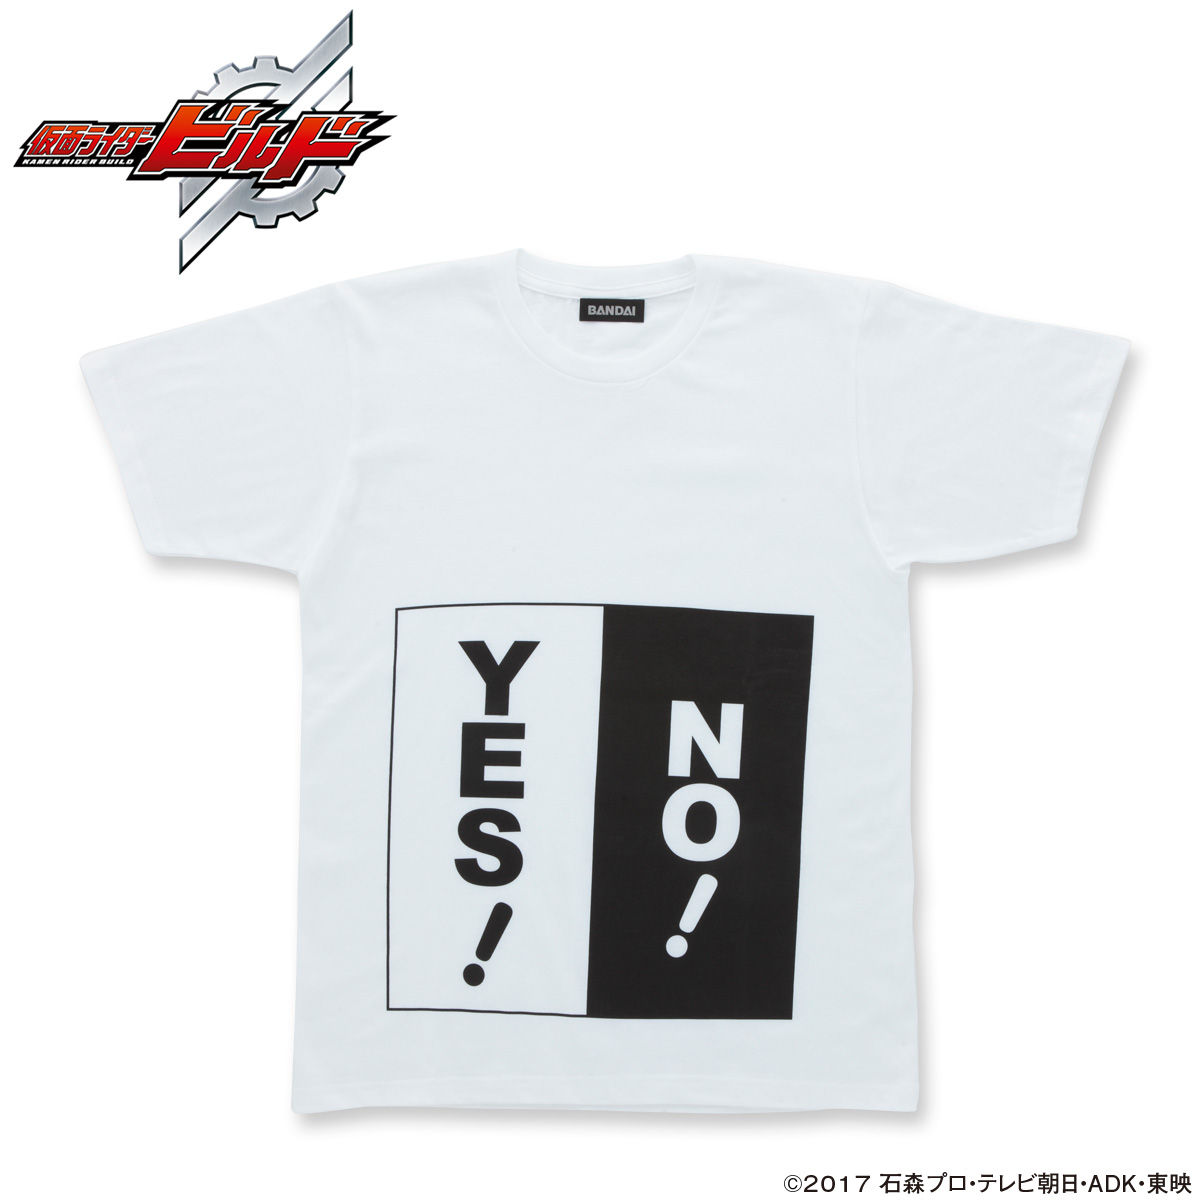 Gentoku Himuro T-shirt I—Kamen Rider Build